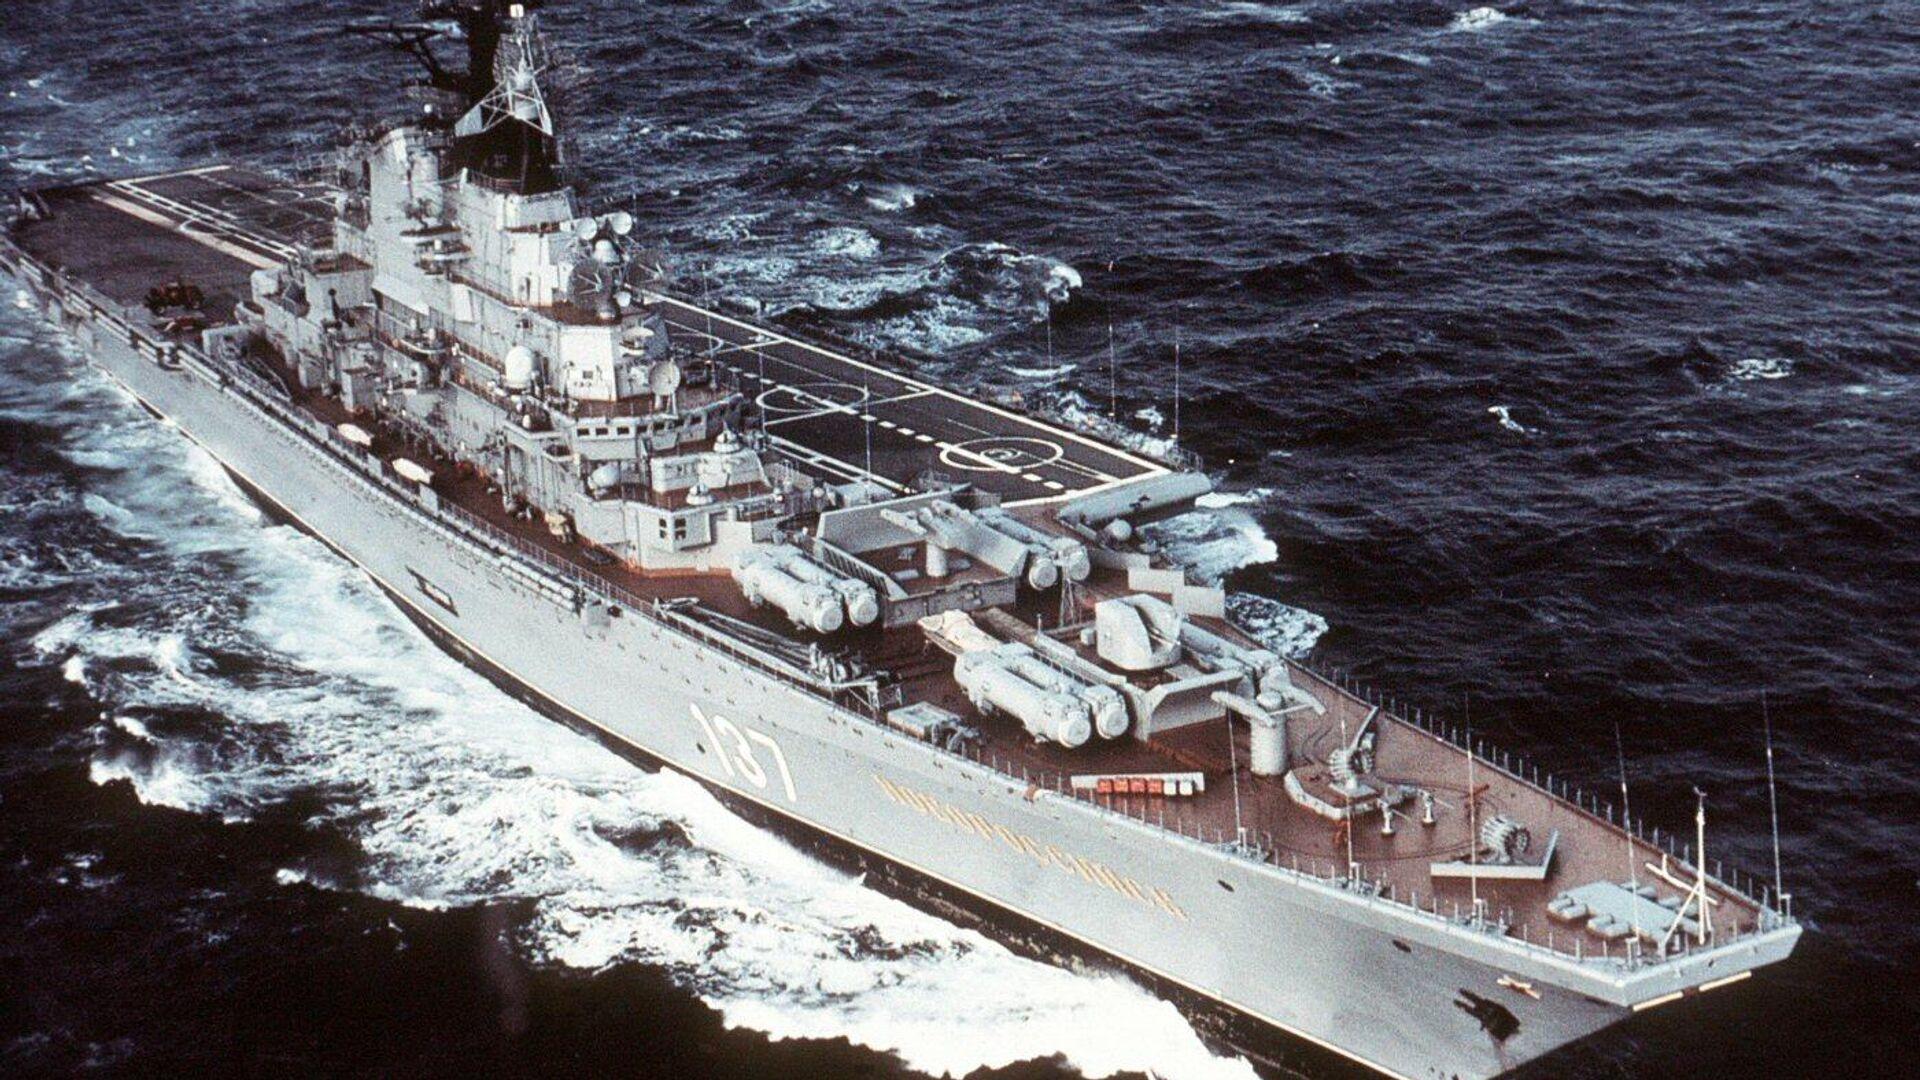 El portaaviones Novorossiysk de la Armada de la URSS - Sputnik Mundo, 1920, 23.04.2021